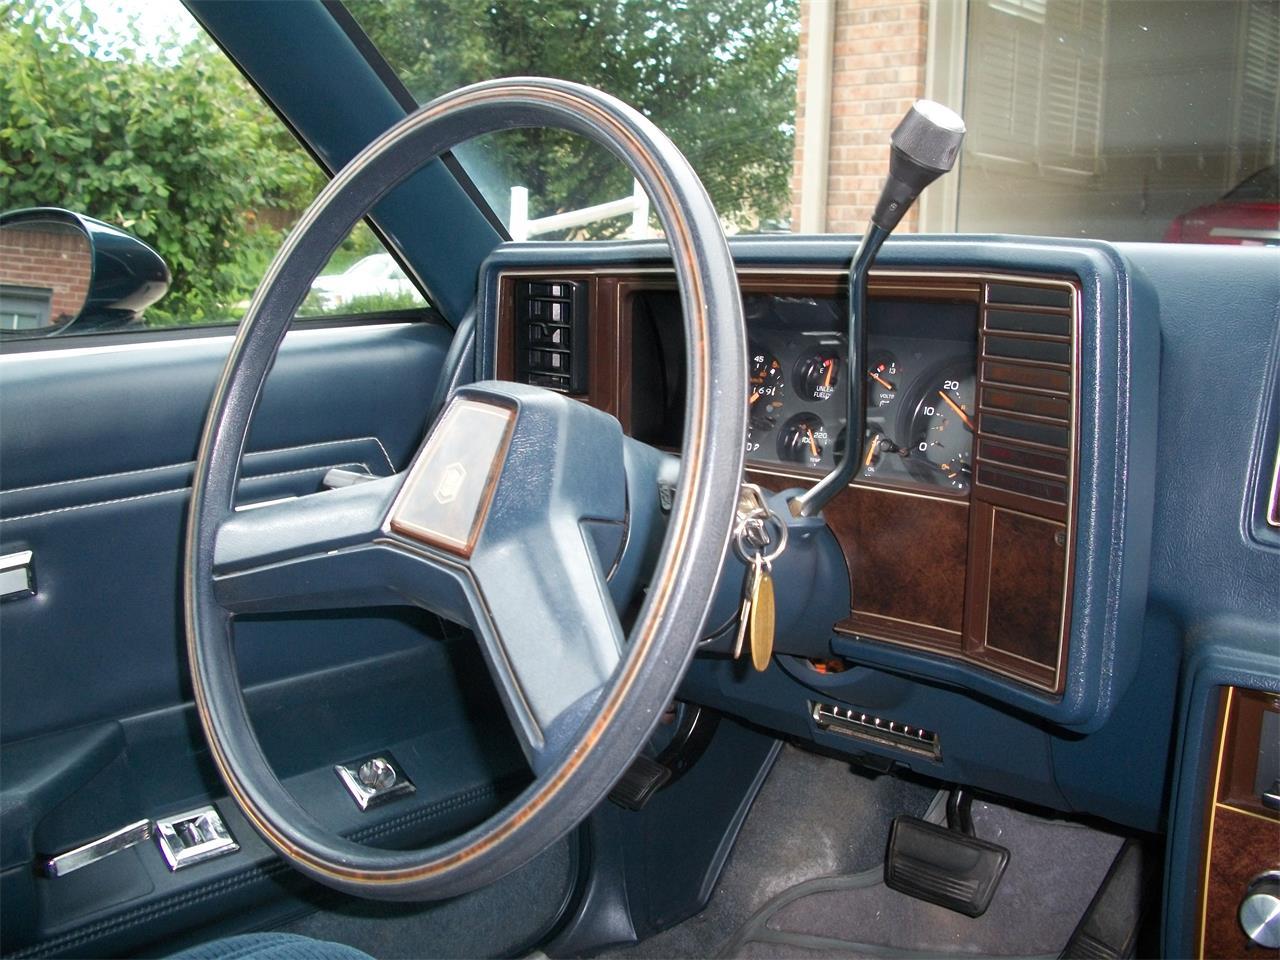 1985 Chevrolet El Camino (CC-1256126) for sale in Avon, Indiana